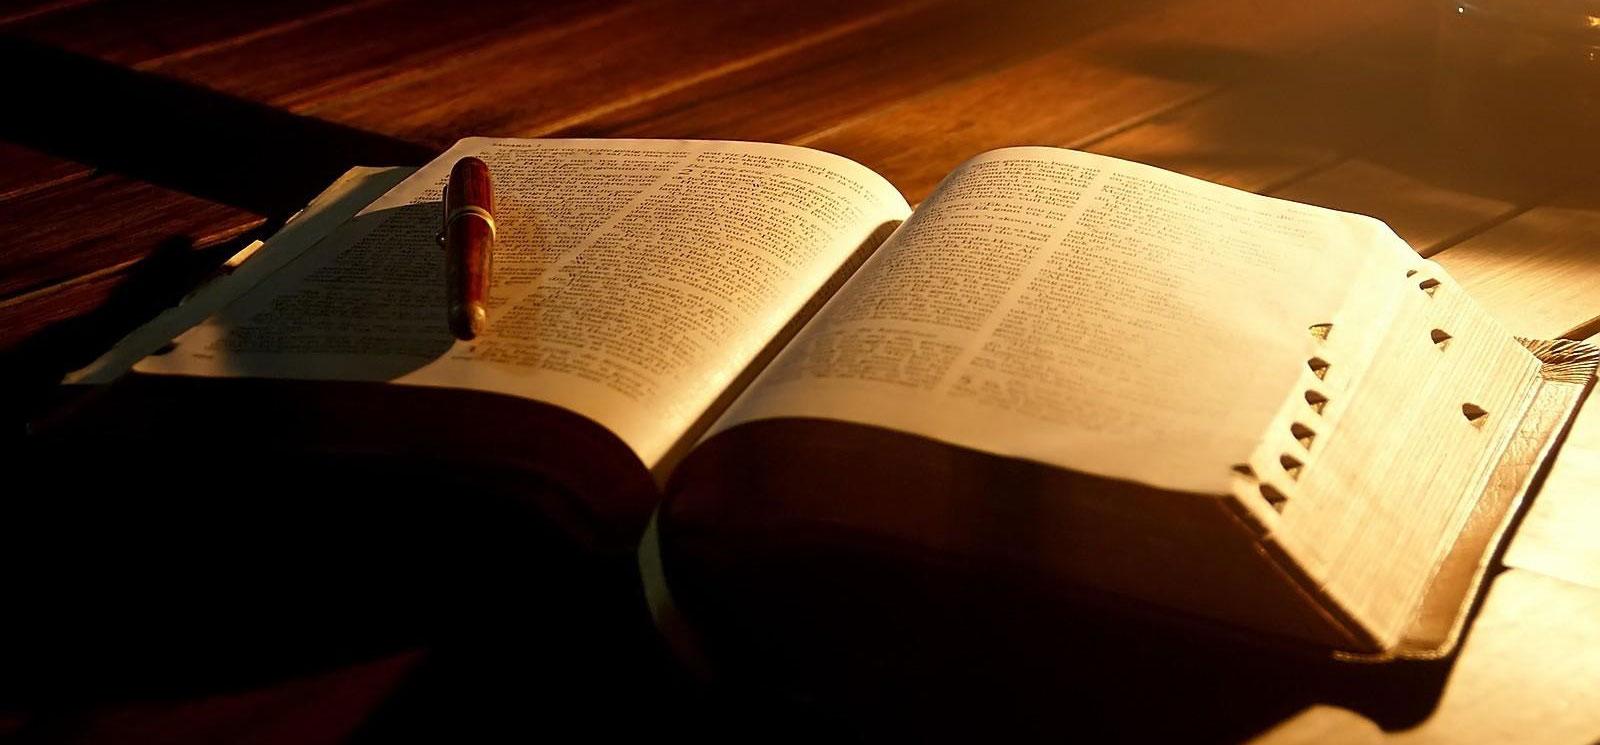 20 características de un culto o una secta religiosa muy peligrosa 6